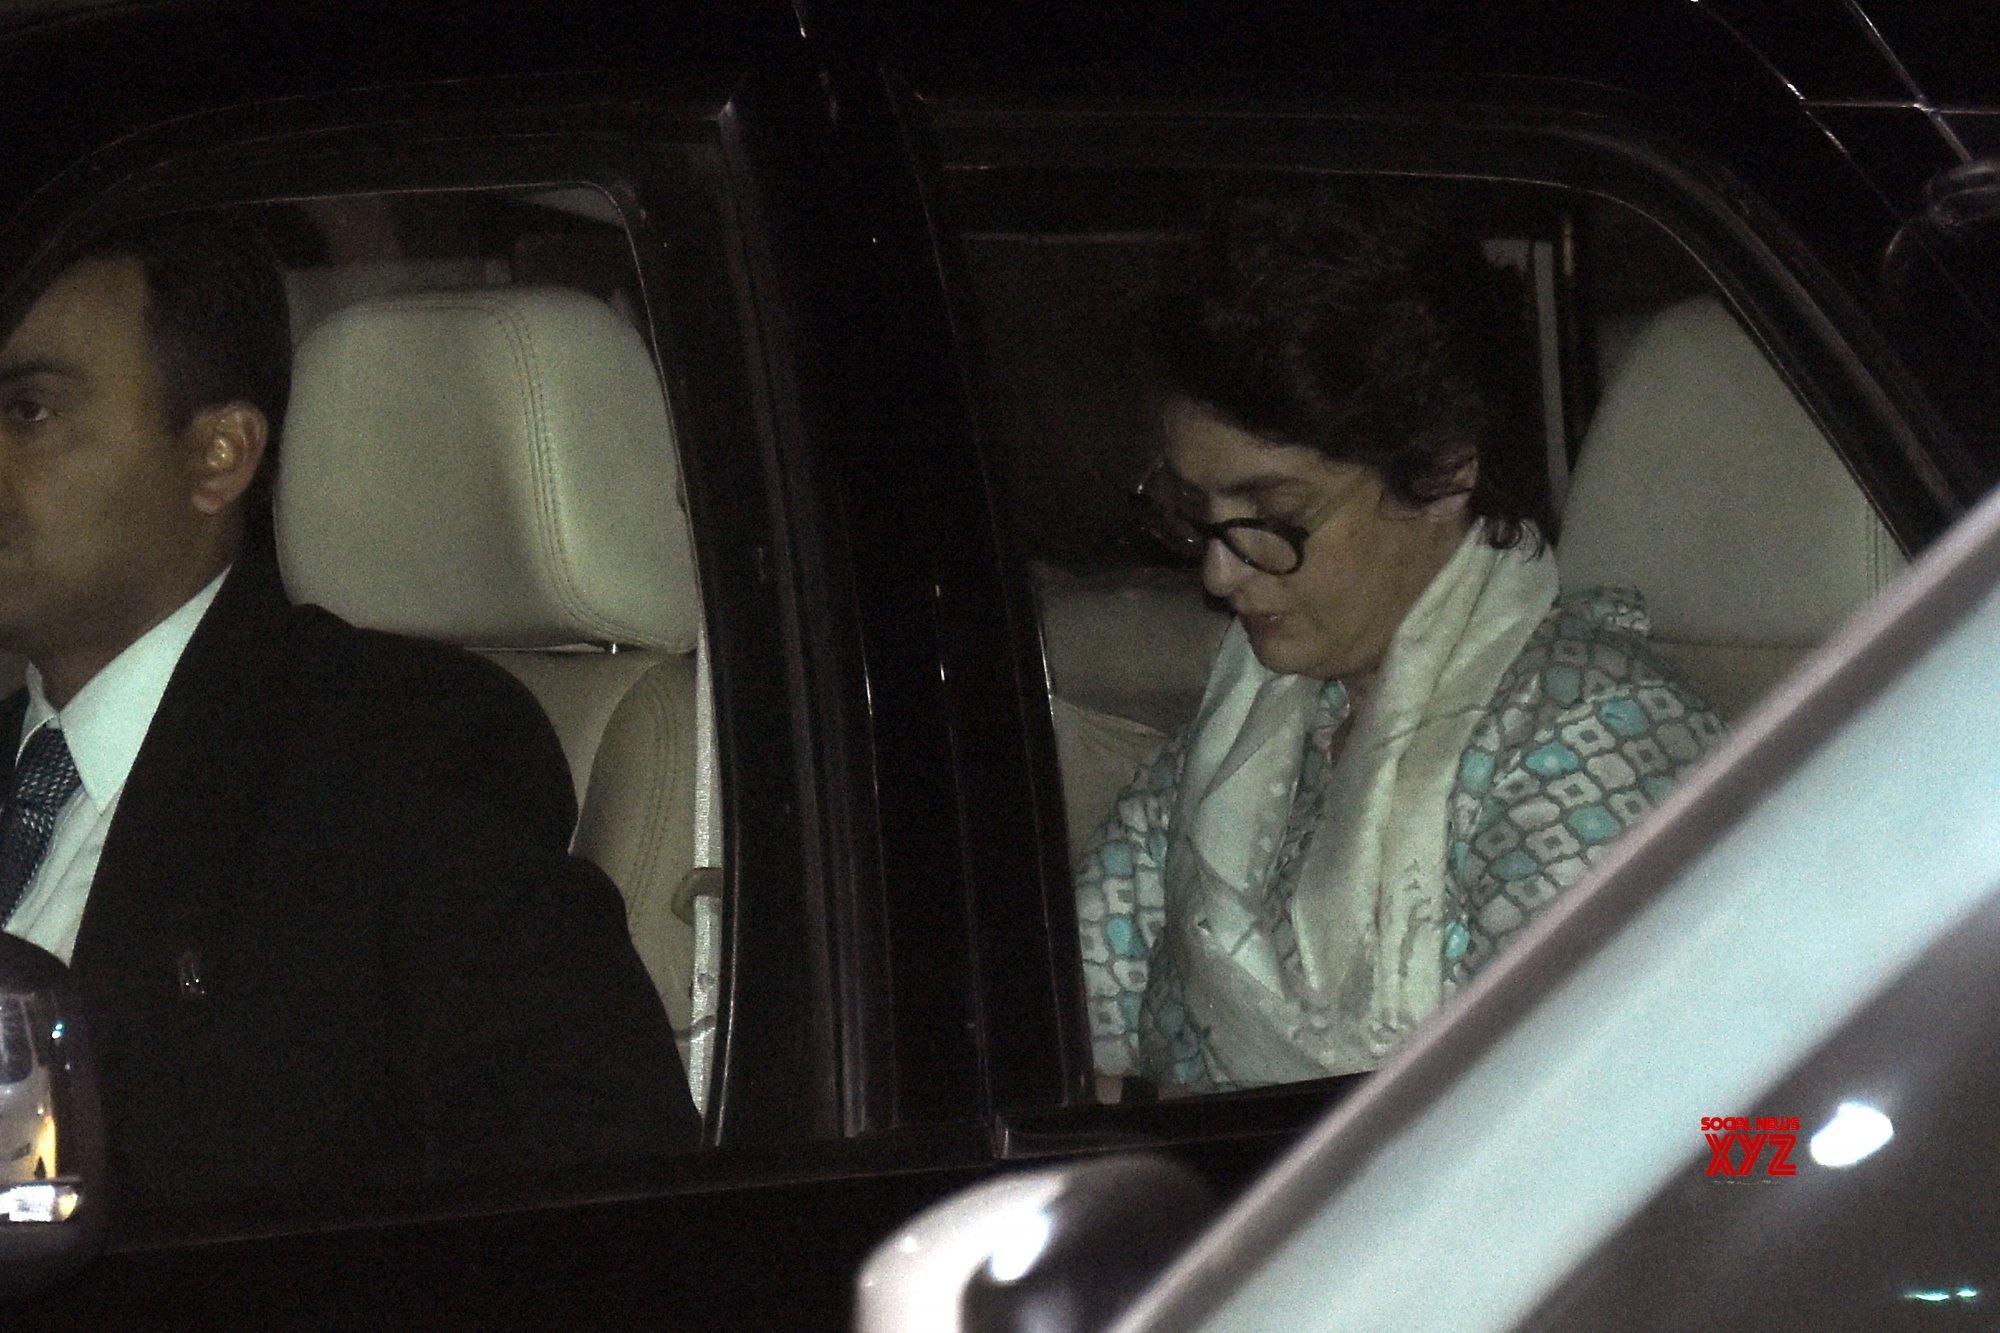 Jaipur: Priyanka Gandhi Vadra arrives in Jaipur #Gallery